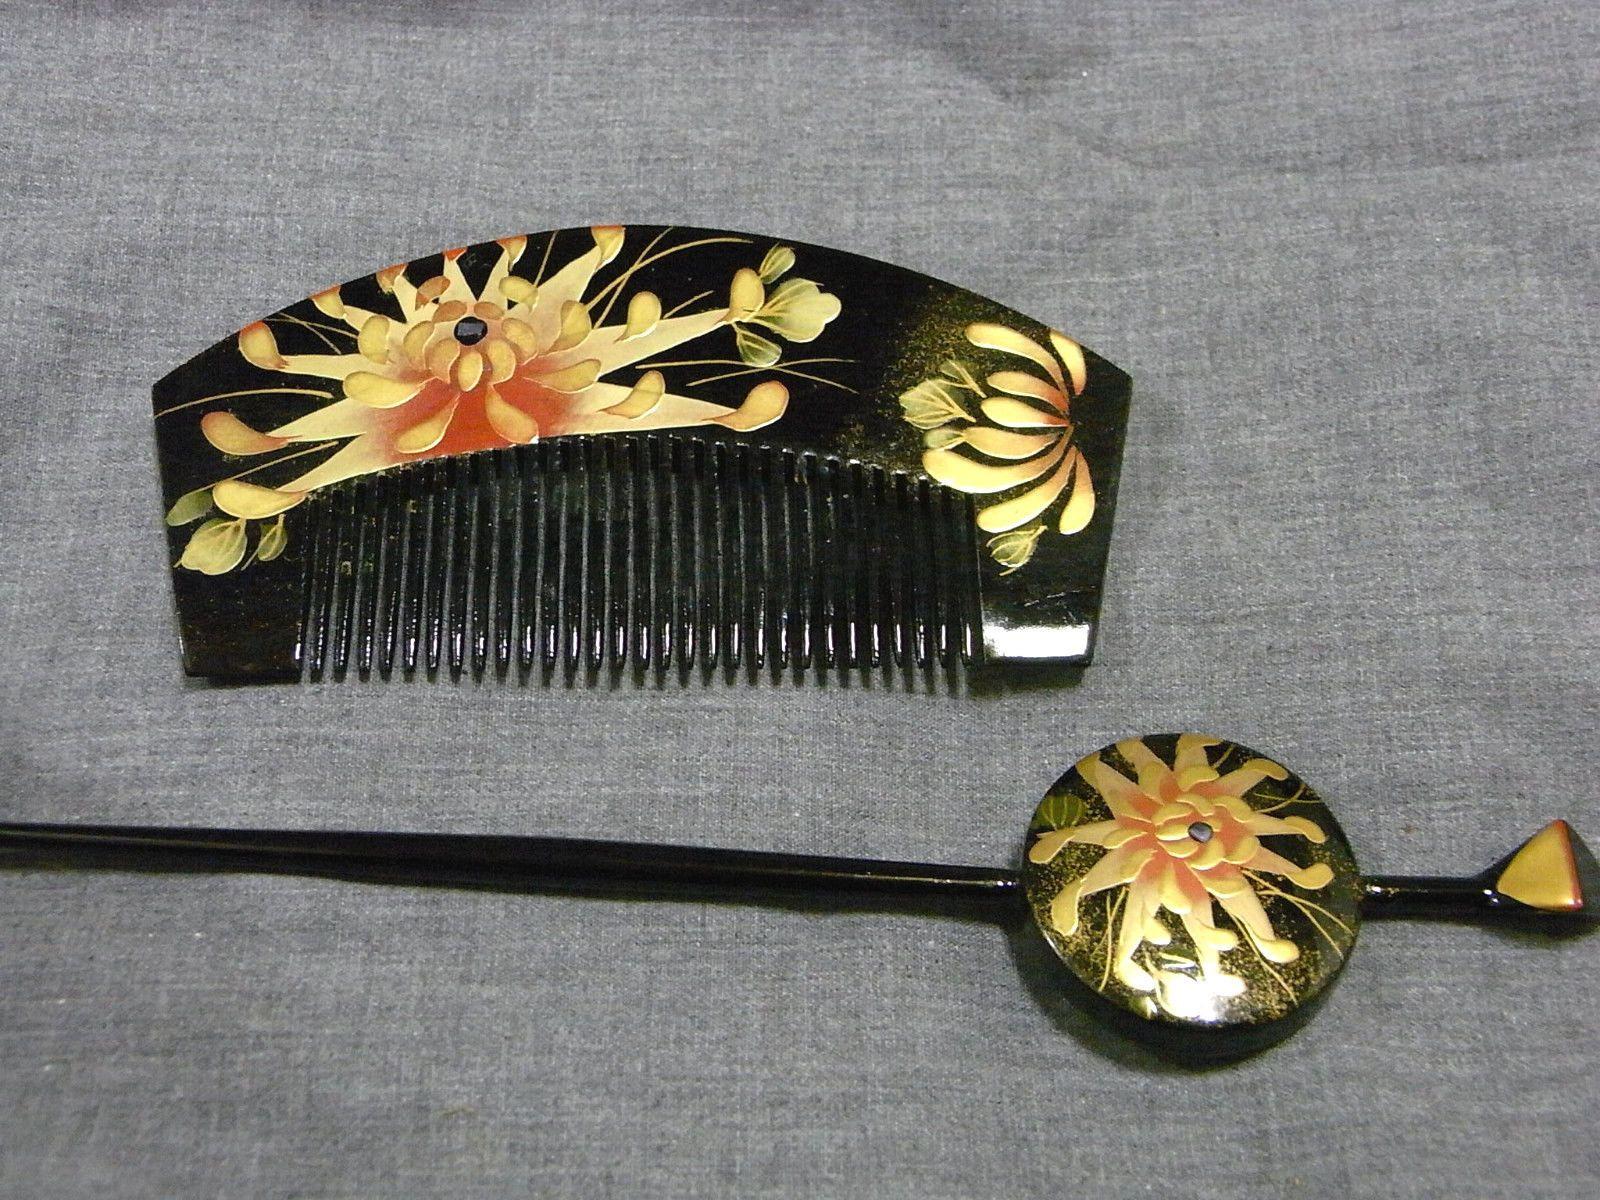 Japanese Gold and Black Hair Accessory Kanzashi Hairpin Kougai Set Chrysanth   eBay